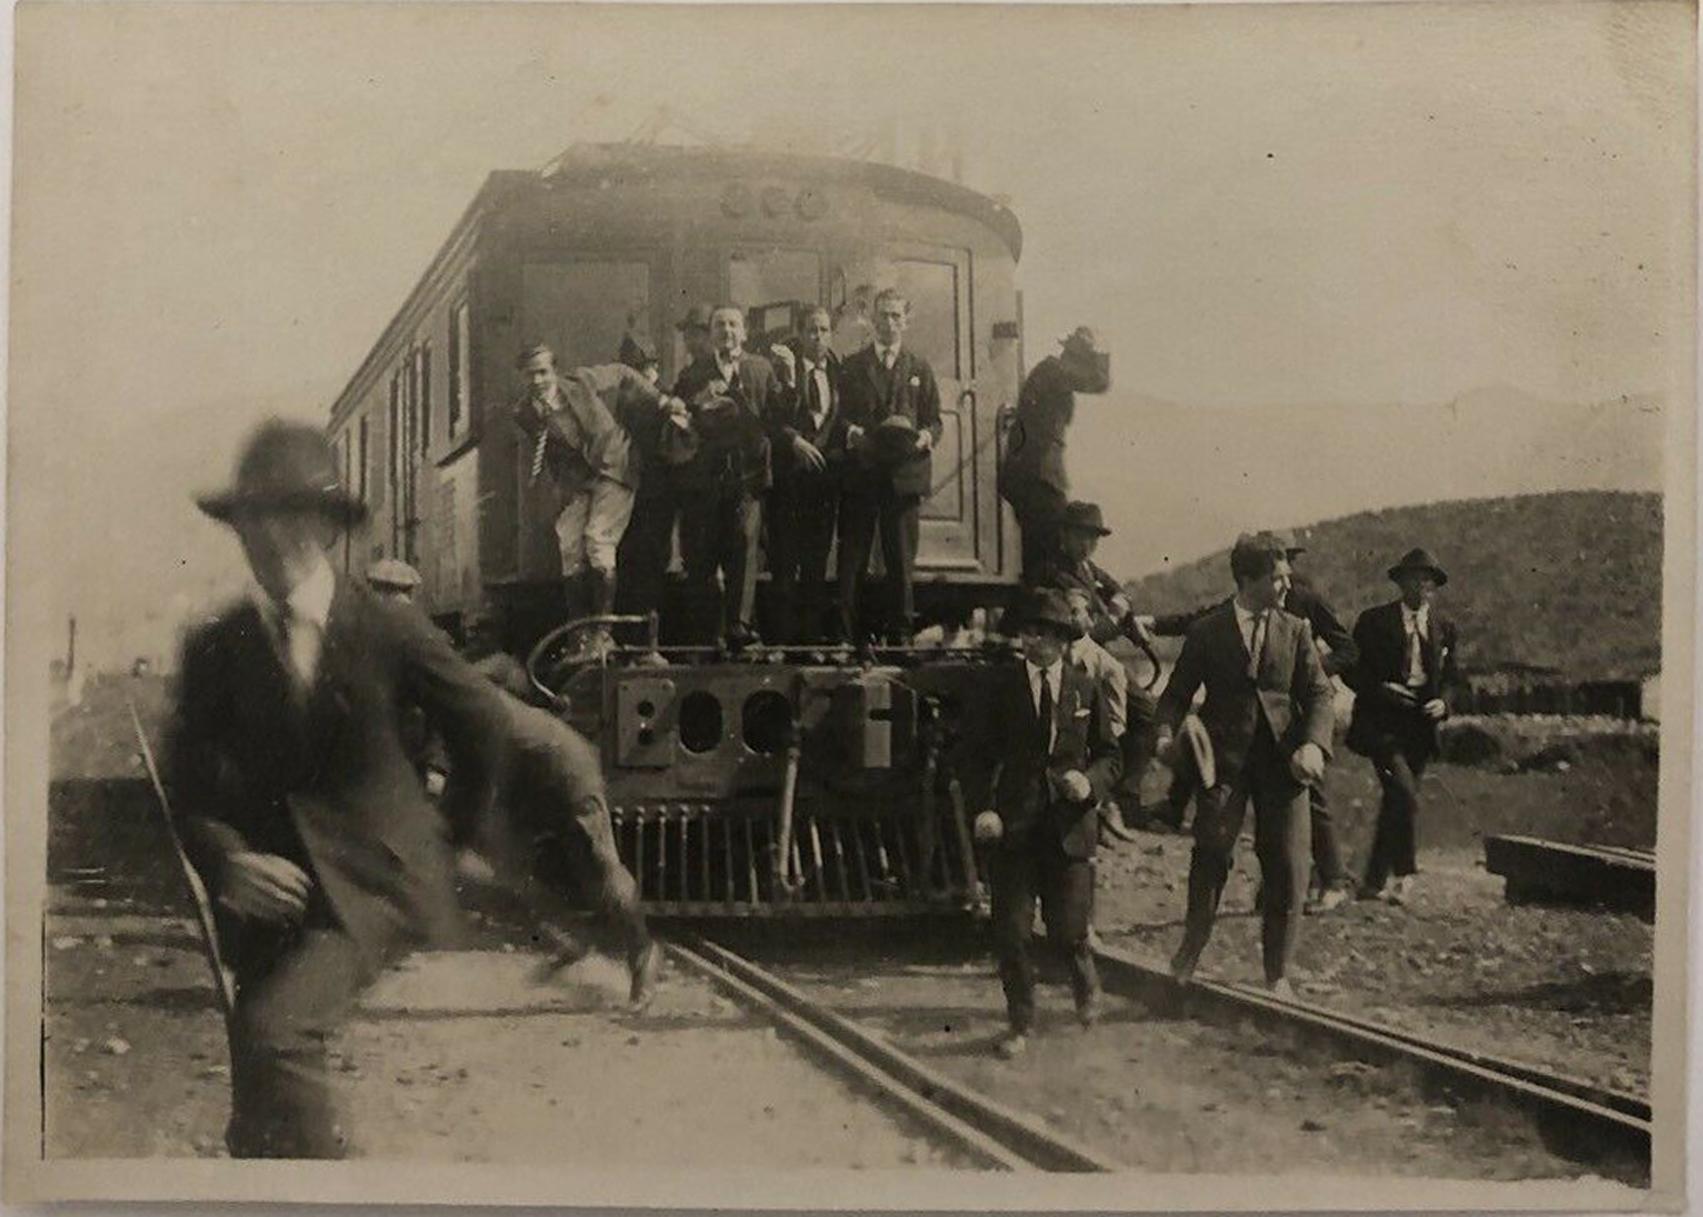 Enterreno - Fotos históricas de chile - fotos antiguas de Chile - Ferrocarril Valparaíso-Santiago, 1922